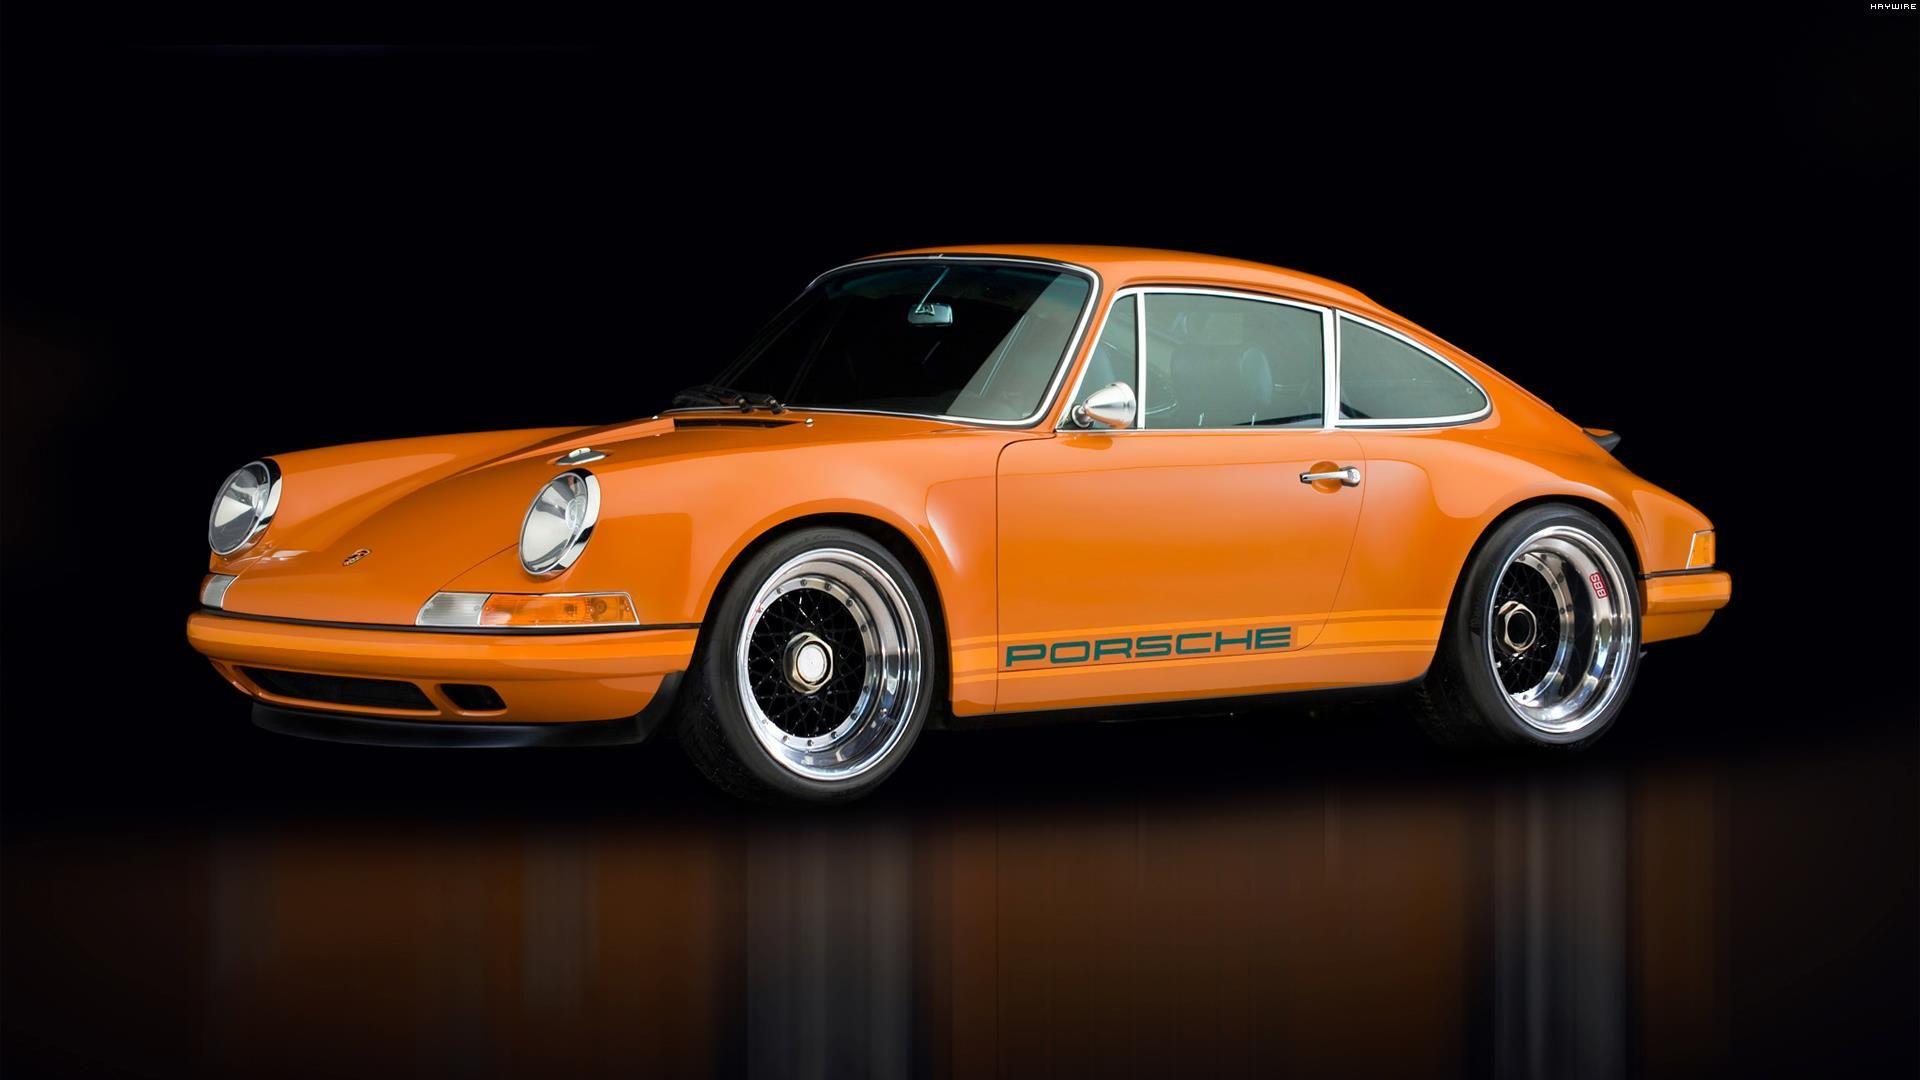 Singer With Images Vintage Porsche Singer Porsche Classic Porsche